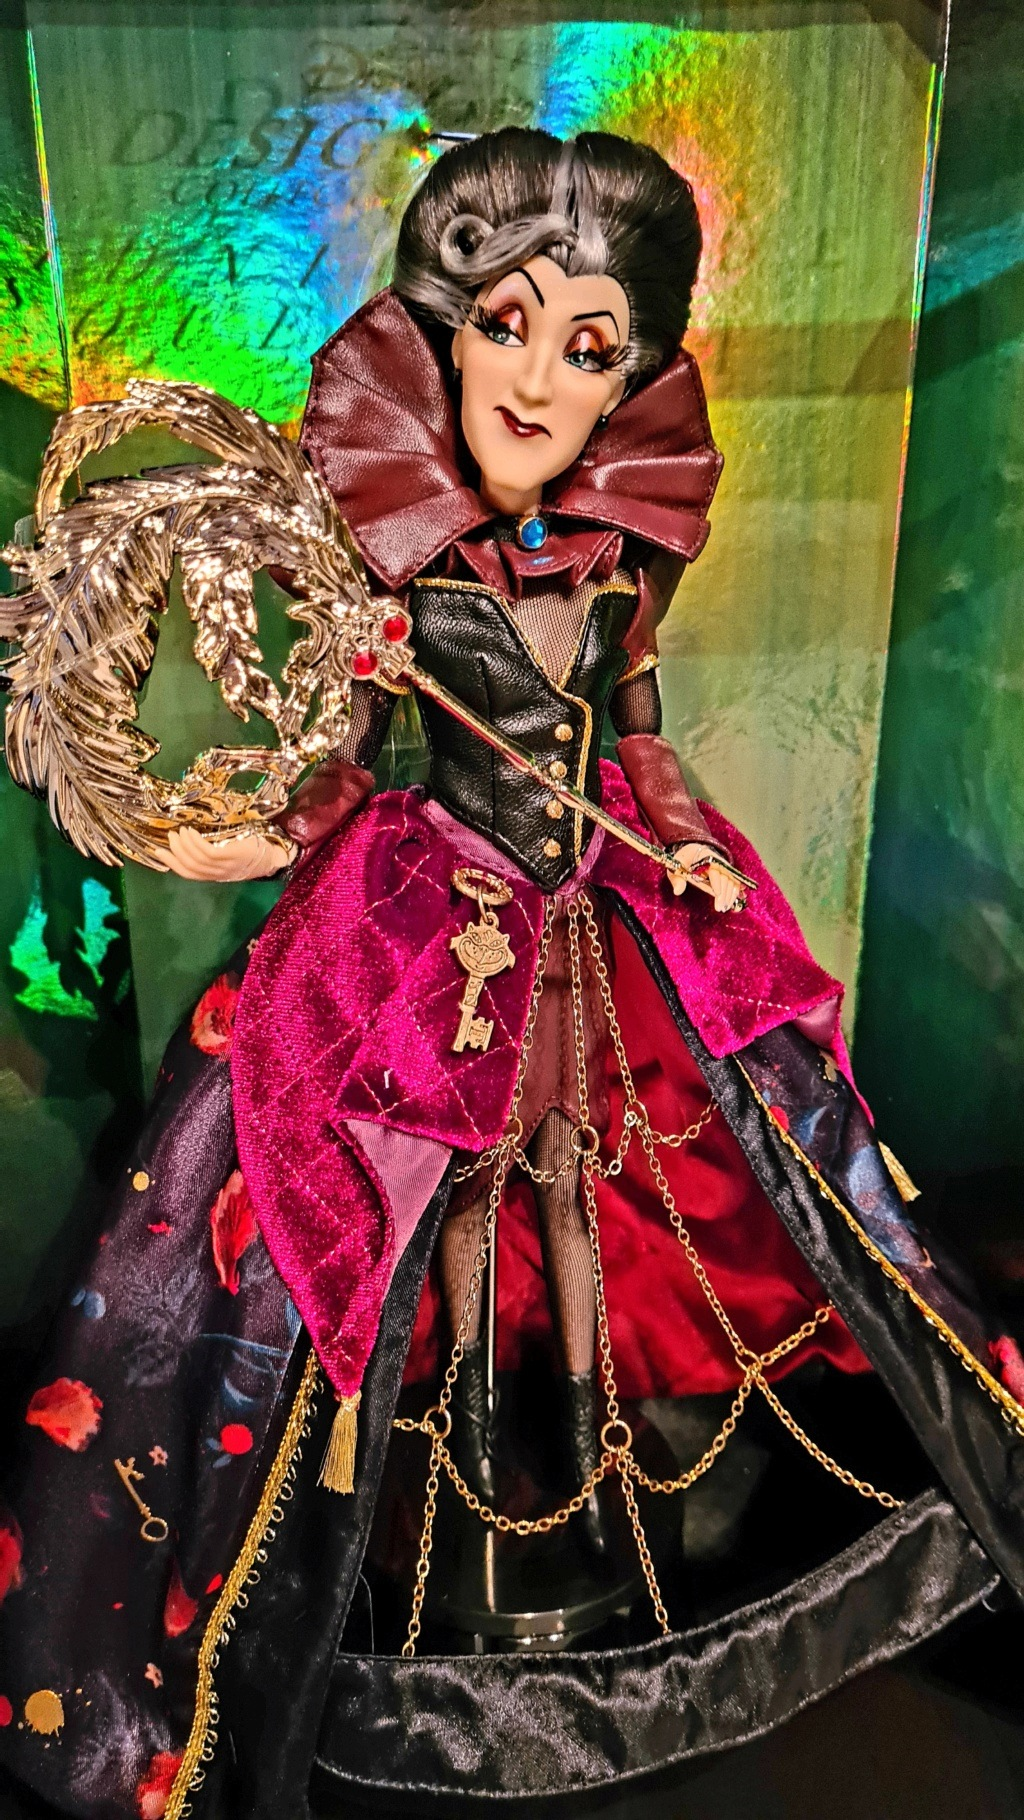 Disney Midnight Masquerade Designer Collection (depuis 2019) - Page 36 20201015